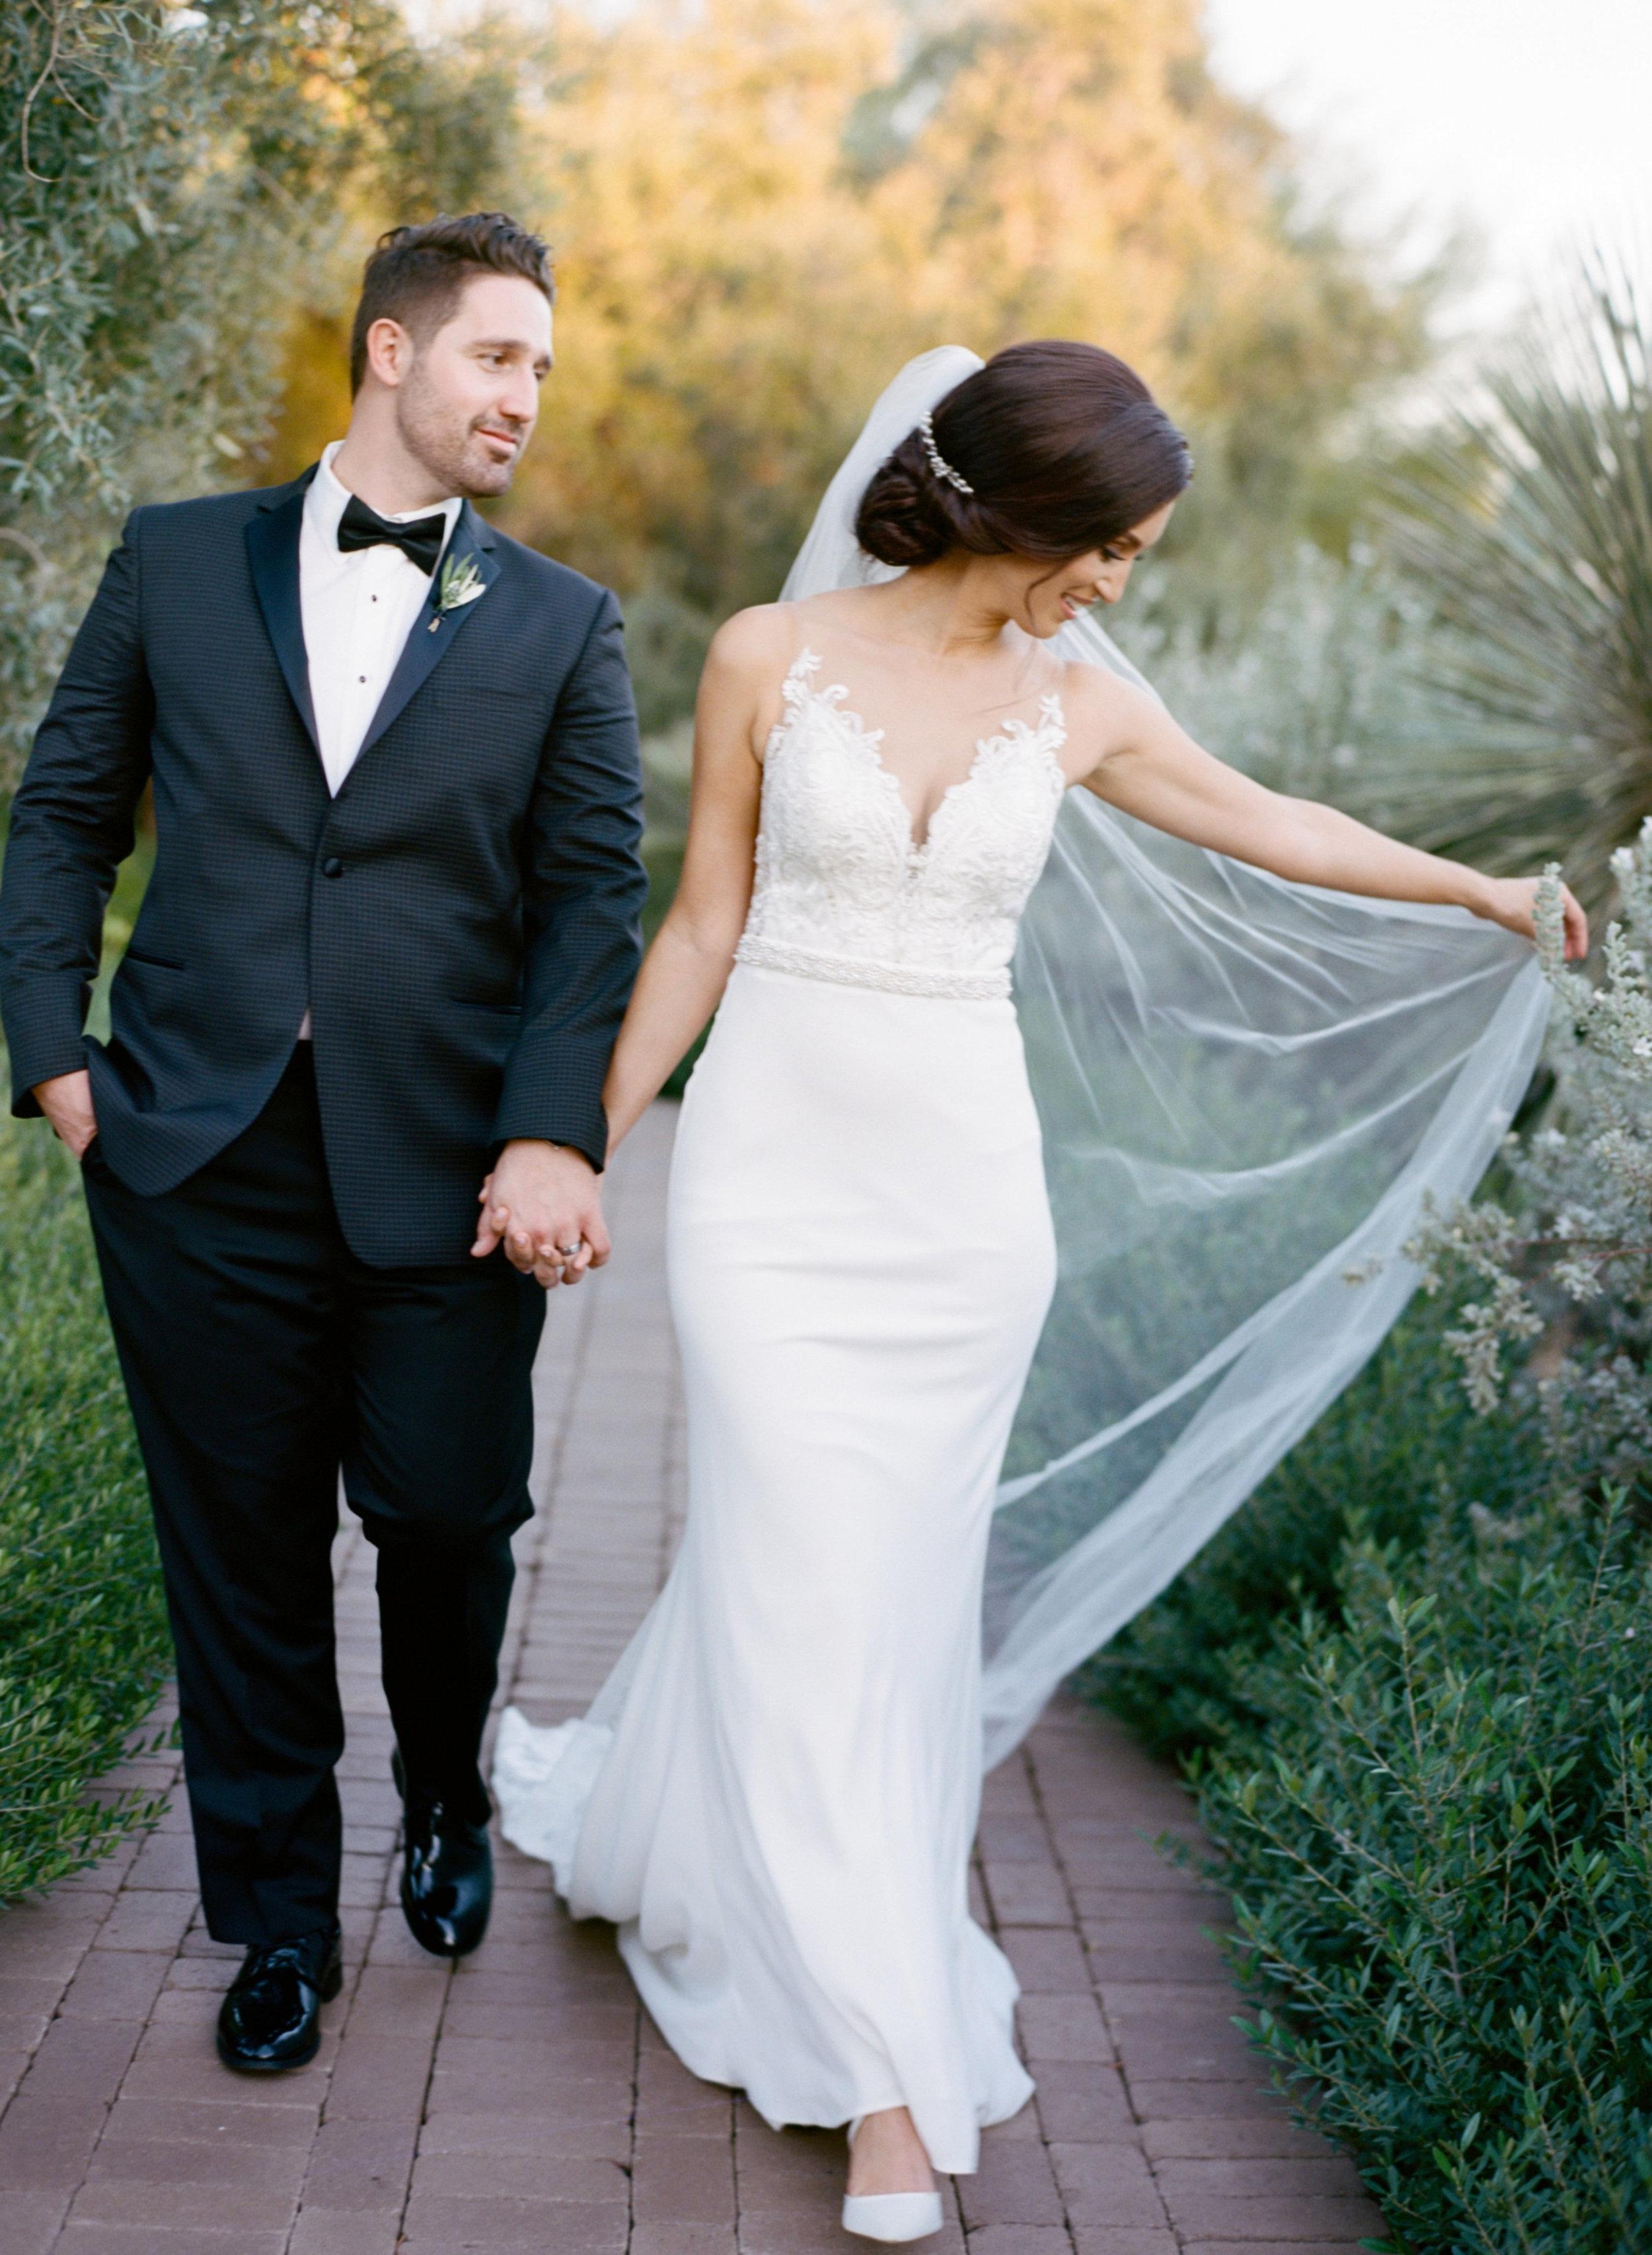 Nick and Erica Wedding at El Chorro-05-8.jpg